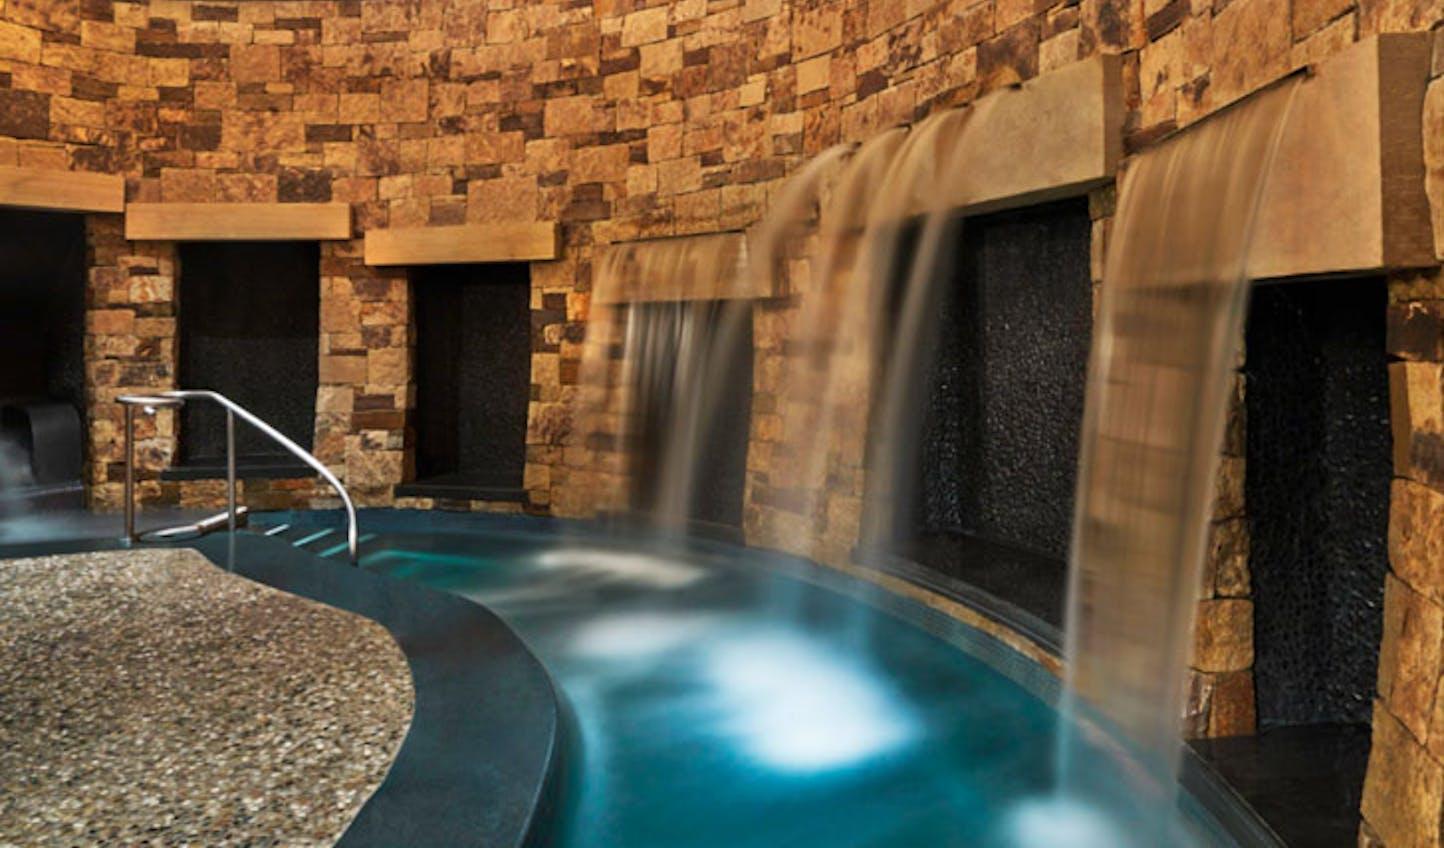 St Regis Pool | Luxury Holidays to Aspen | Black Tomato